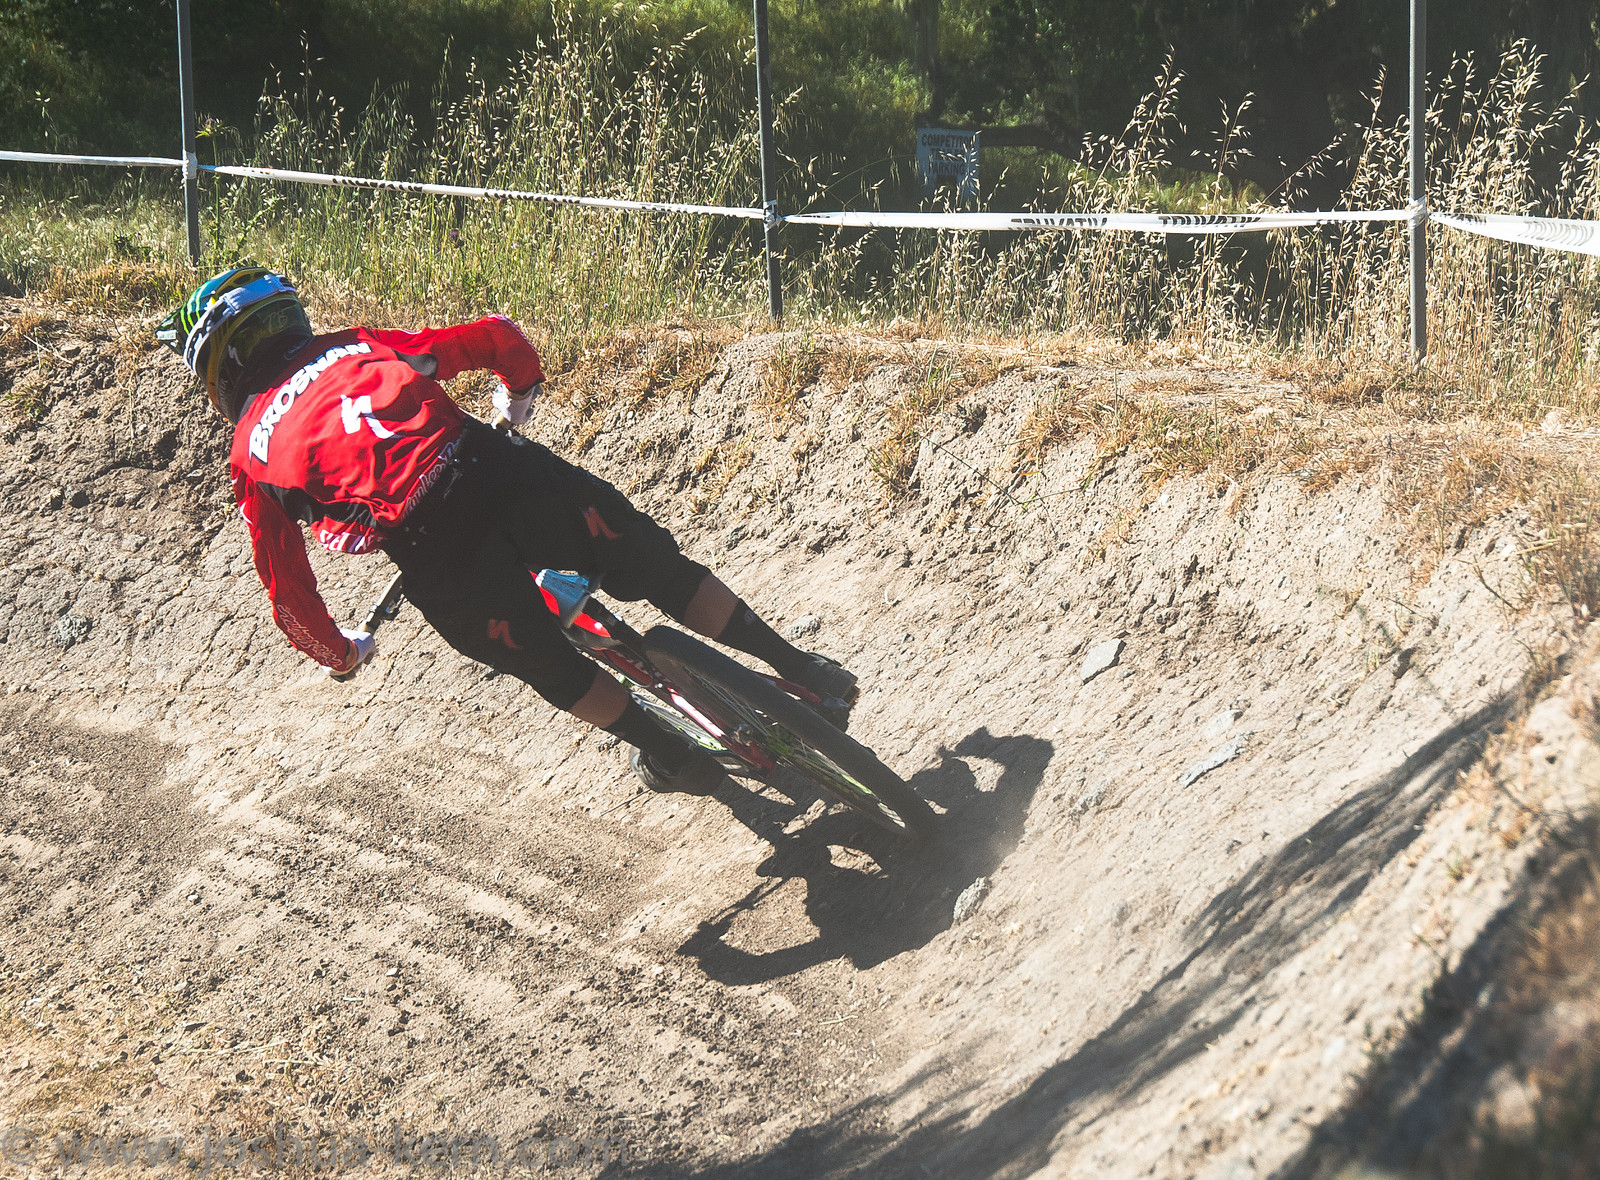 4-19-13DHPractice (15 of 36) - jkern620 - Mountain Biking Pictures - Vital MTB